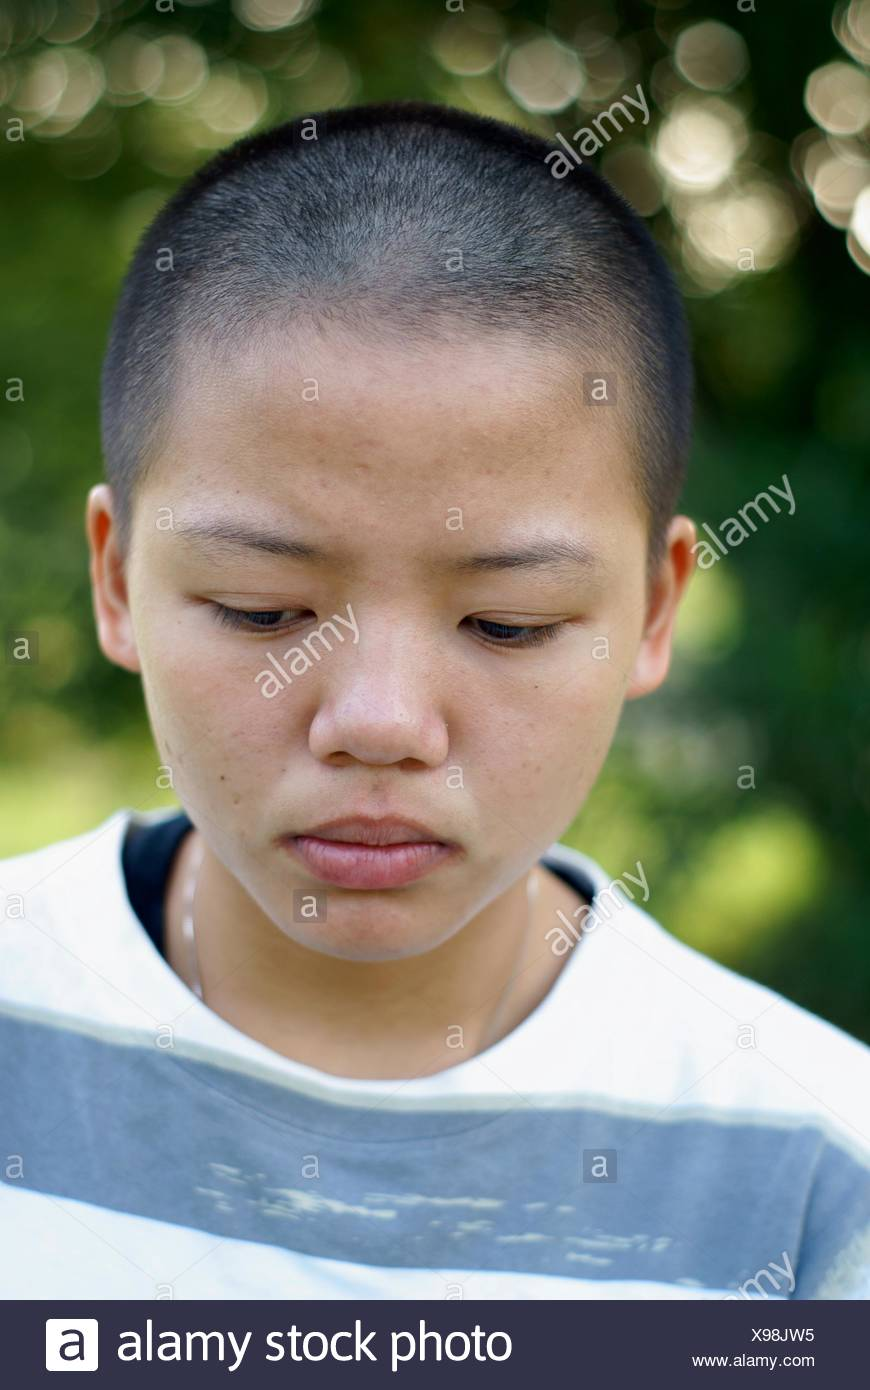 Real bald head teen girls pics right! think